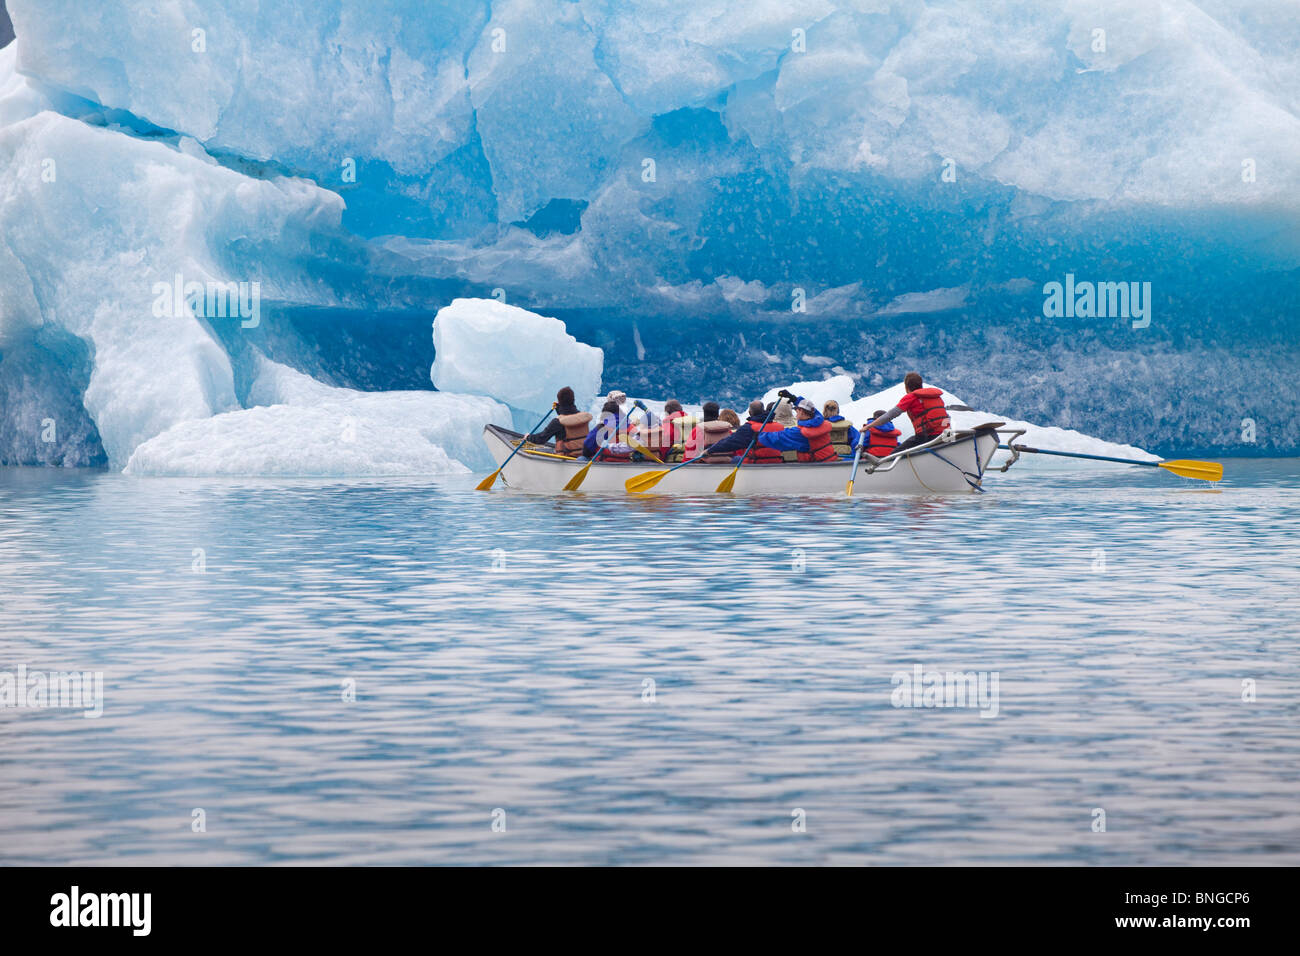 USA; Alaska; Juneau; Mendenhall Glacier  Tourist touring the glacier in a canoe - Stock Image